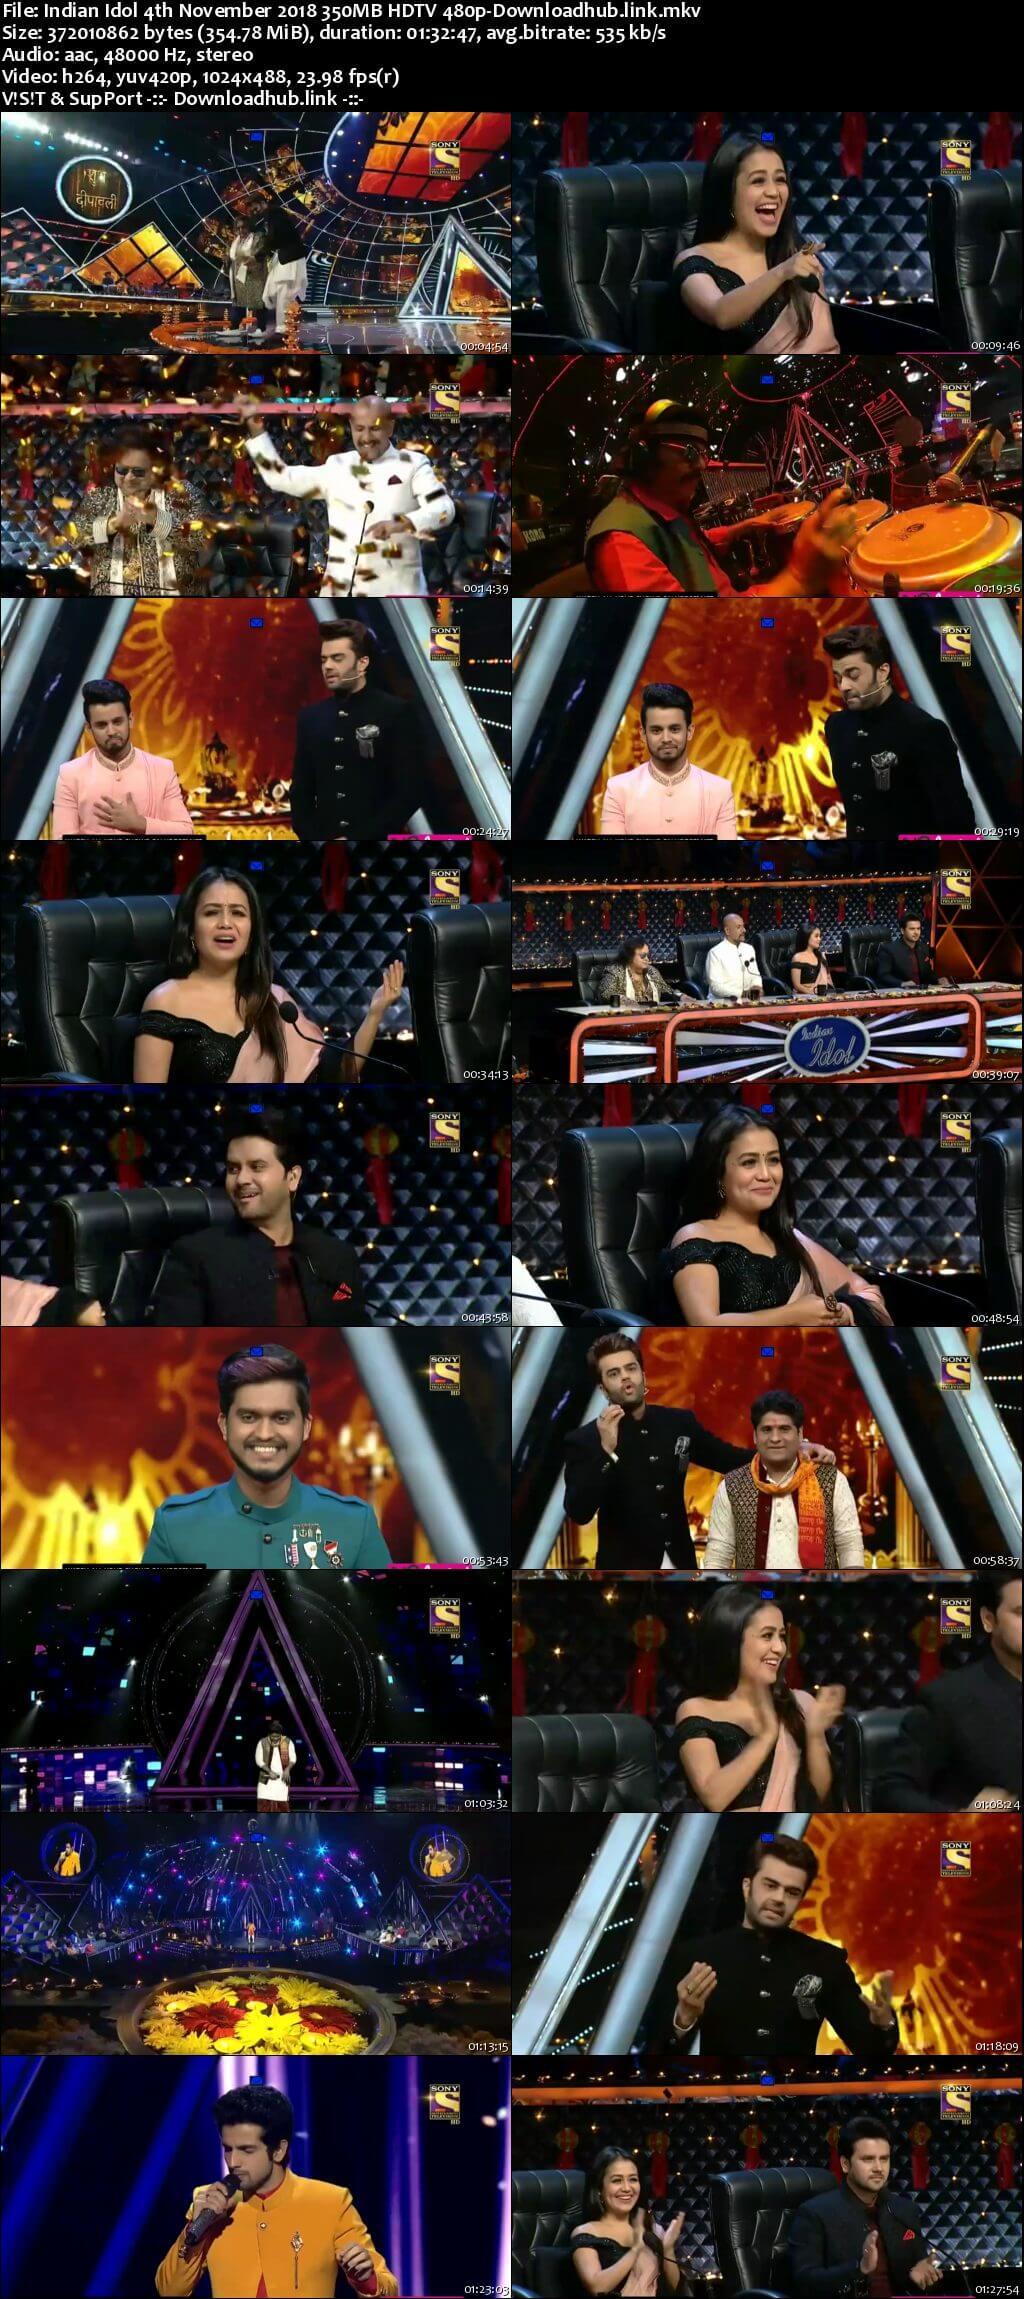 Indian Idol 04 November 2018 Episode 36 HDTV 480p